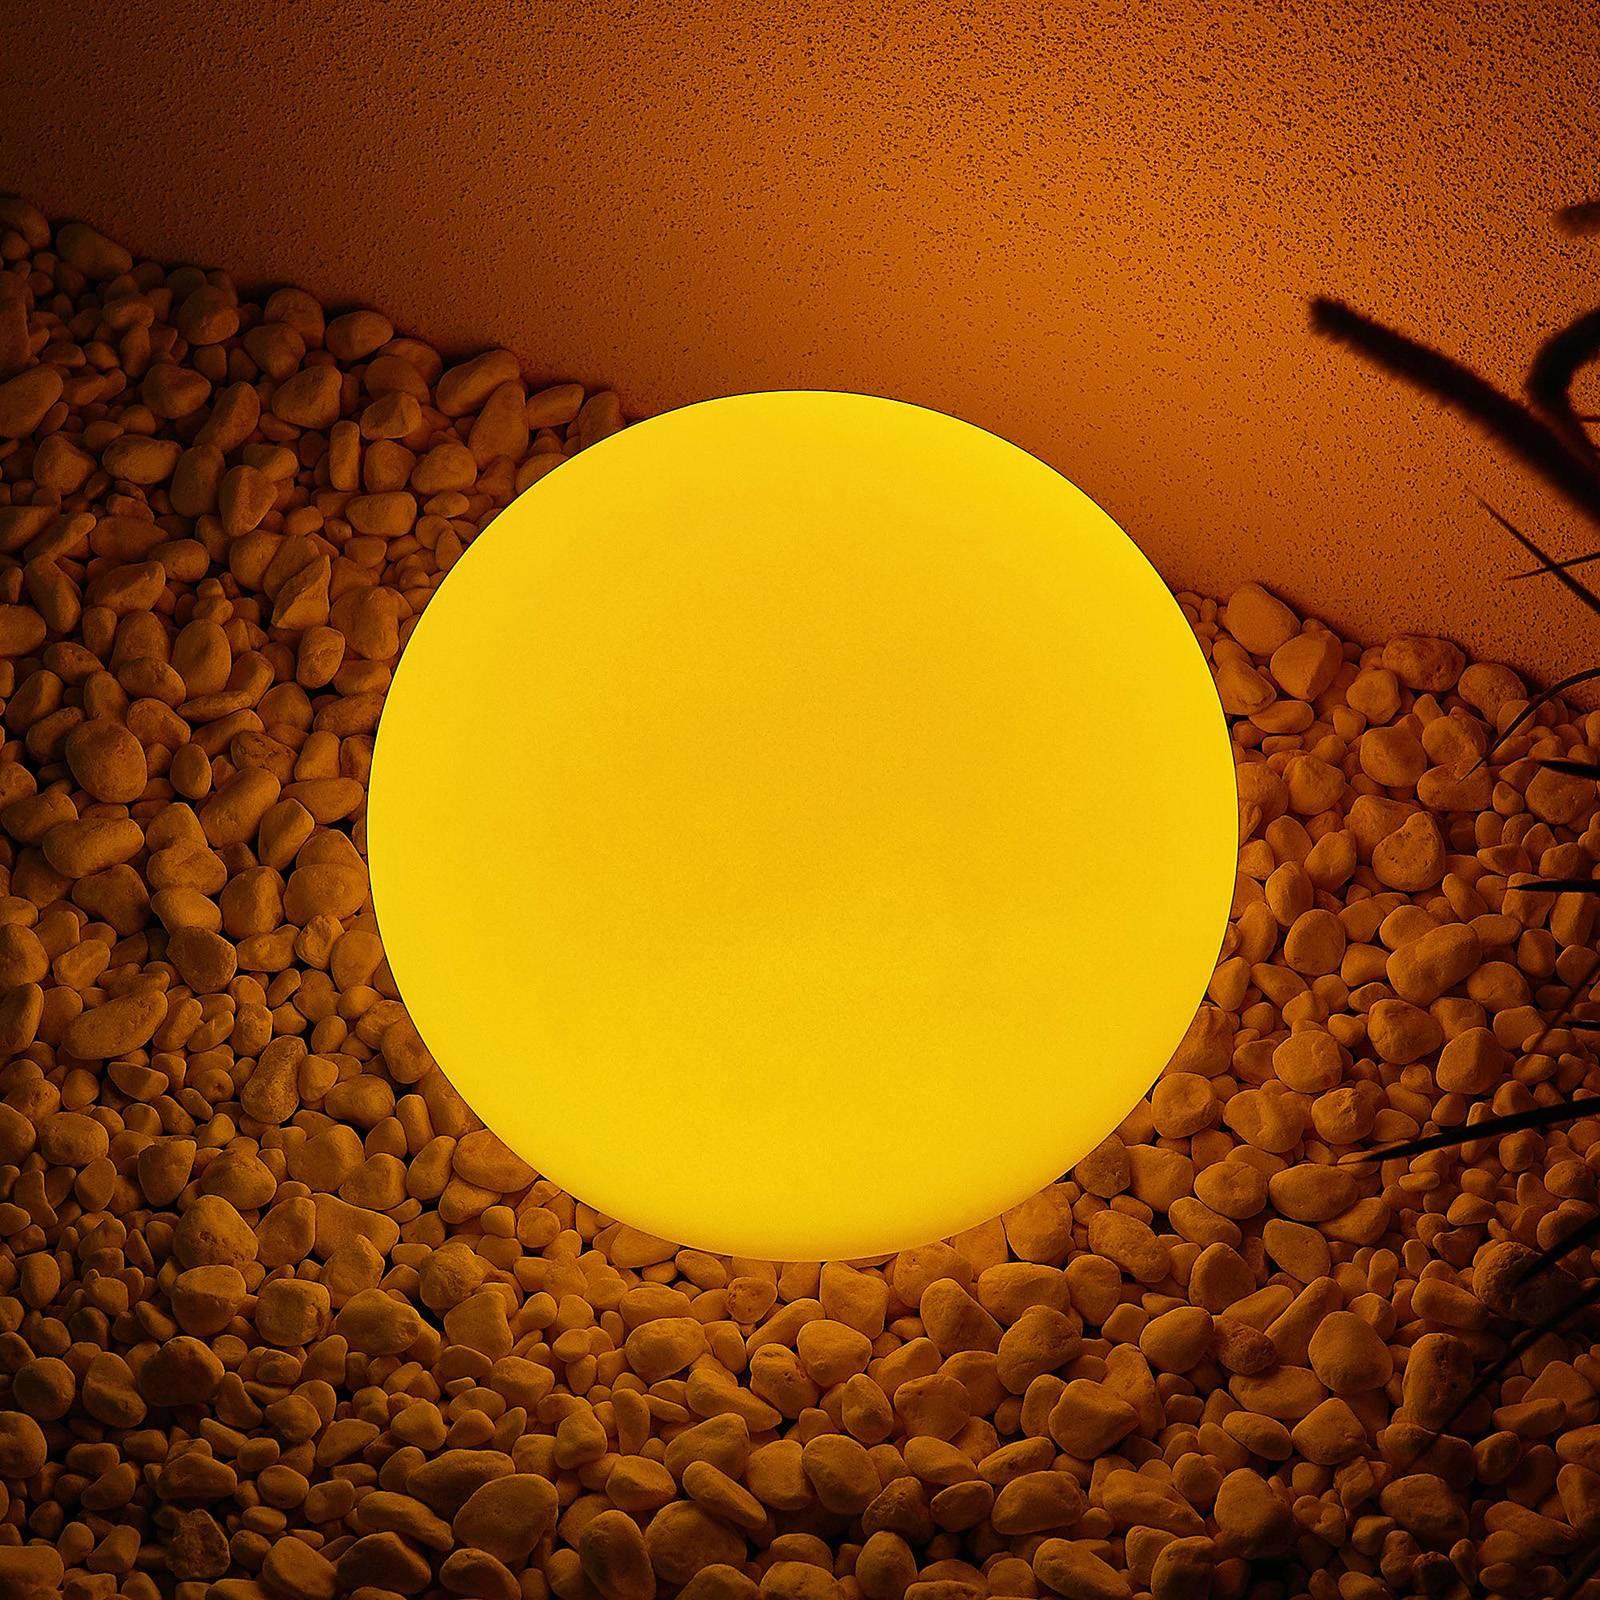 Lindby Yohan RGB-LED-aurinkovalaisin, 25 cm